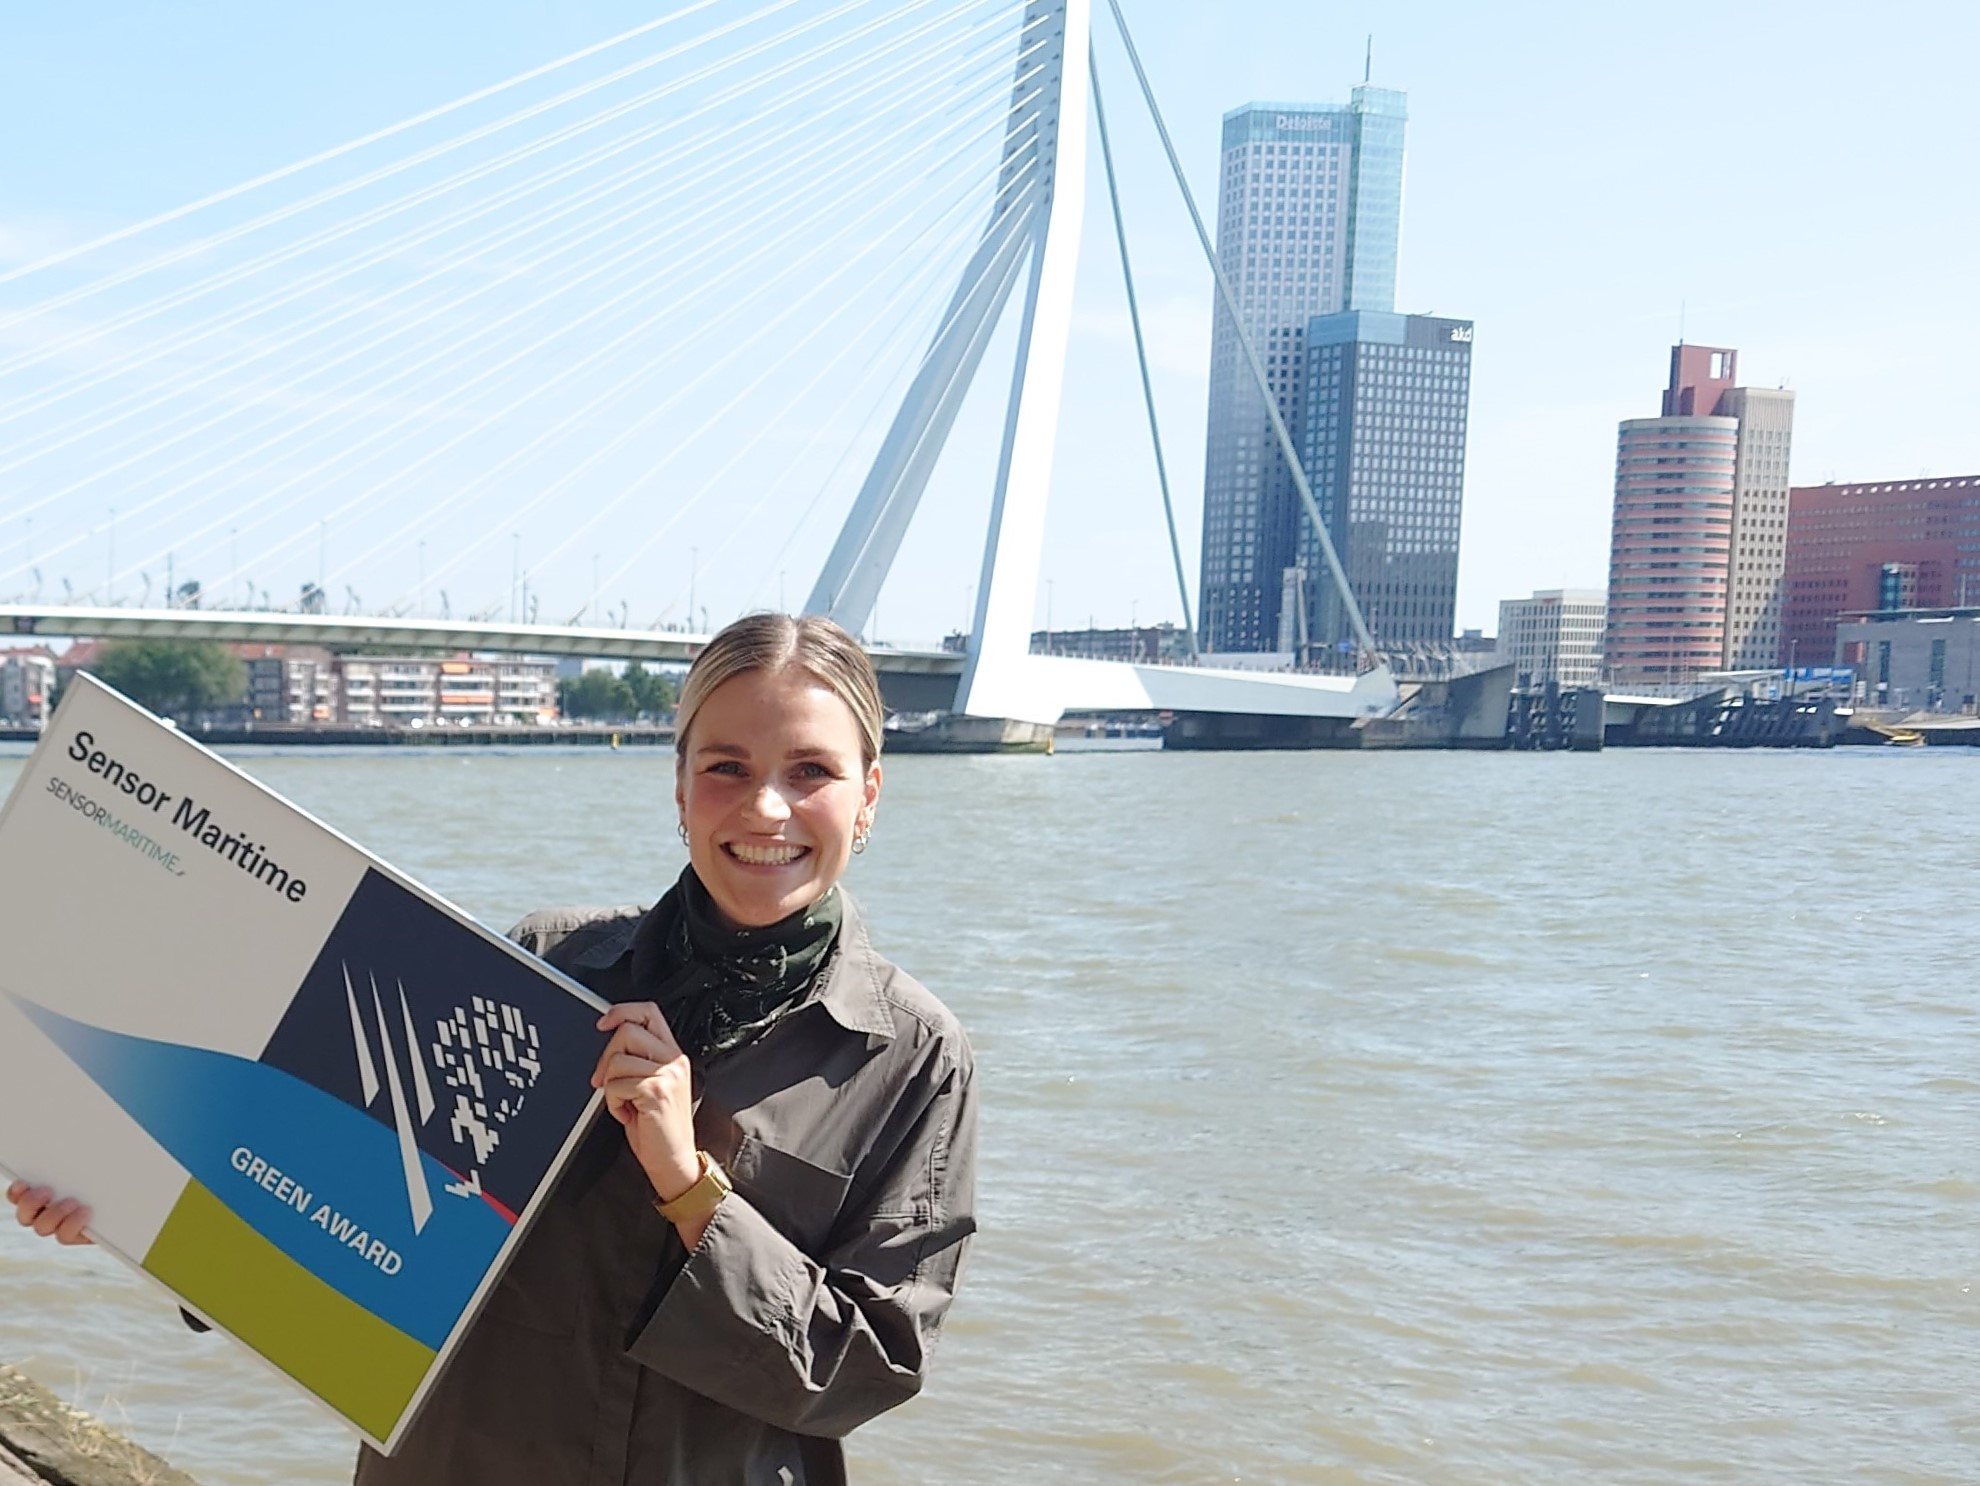 Anouk van de Pol is Team Lead bij Sensor Maritime. (Foto Green Award)